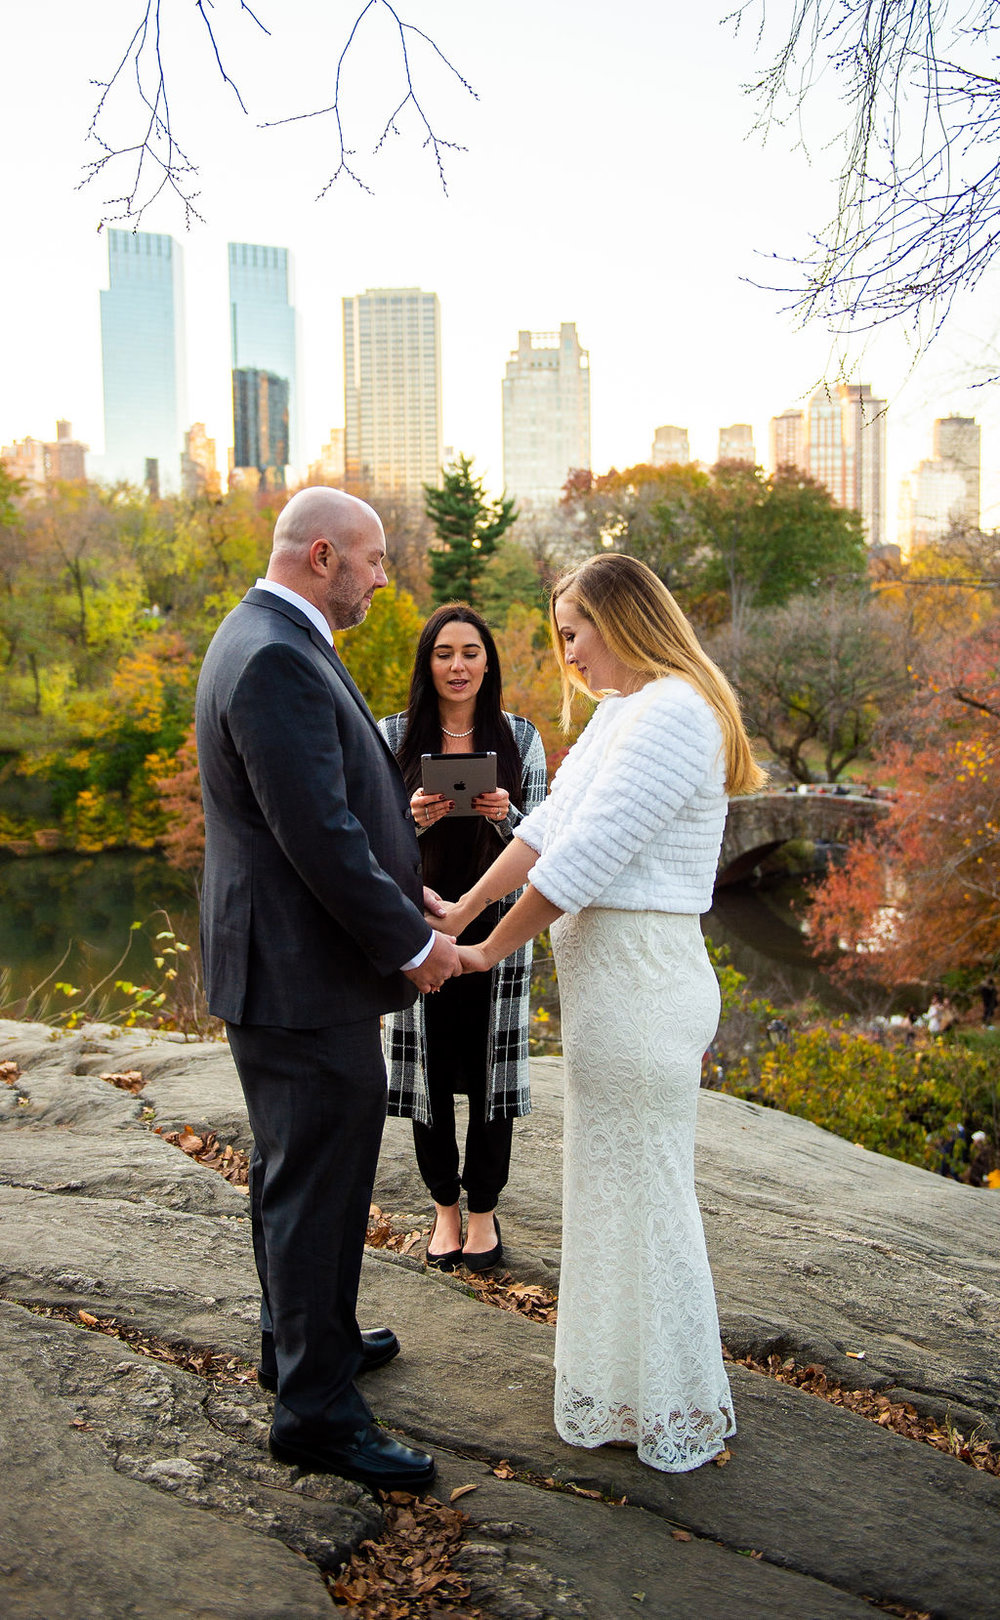 """11/11 make a wish"" on November 11th. Photo by  De Nueva Photography."